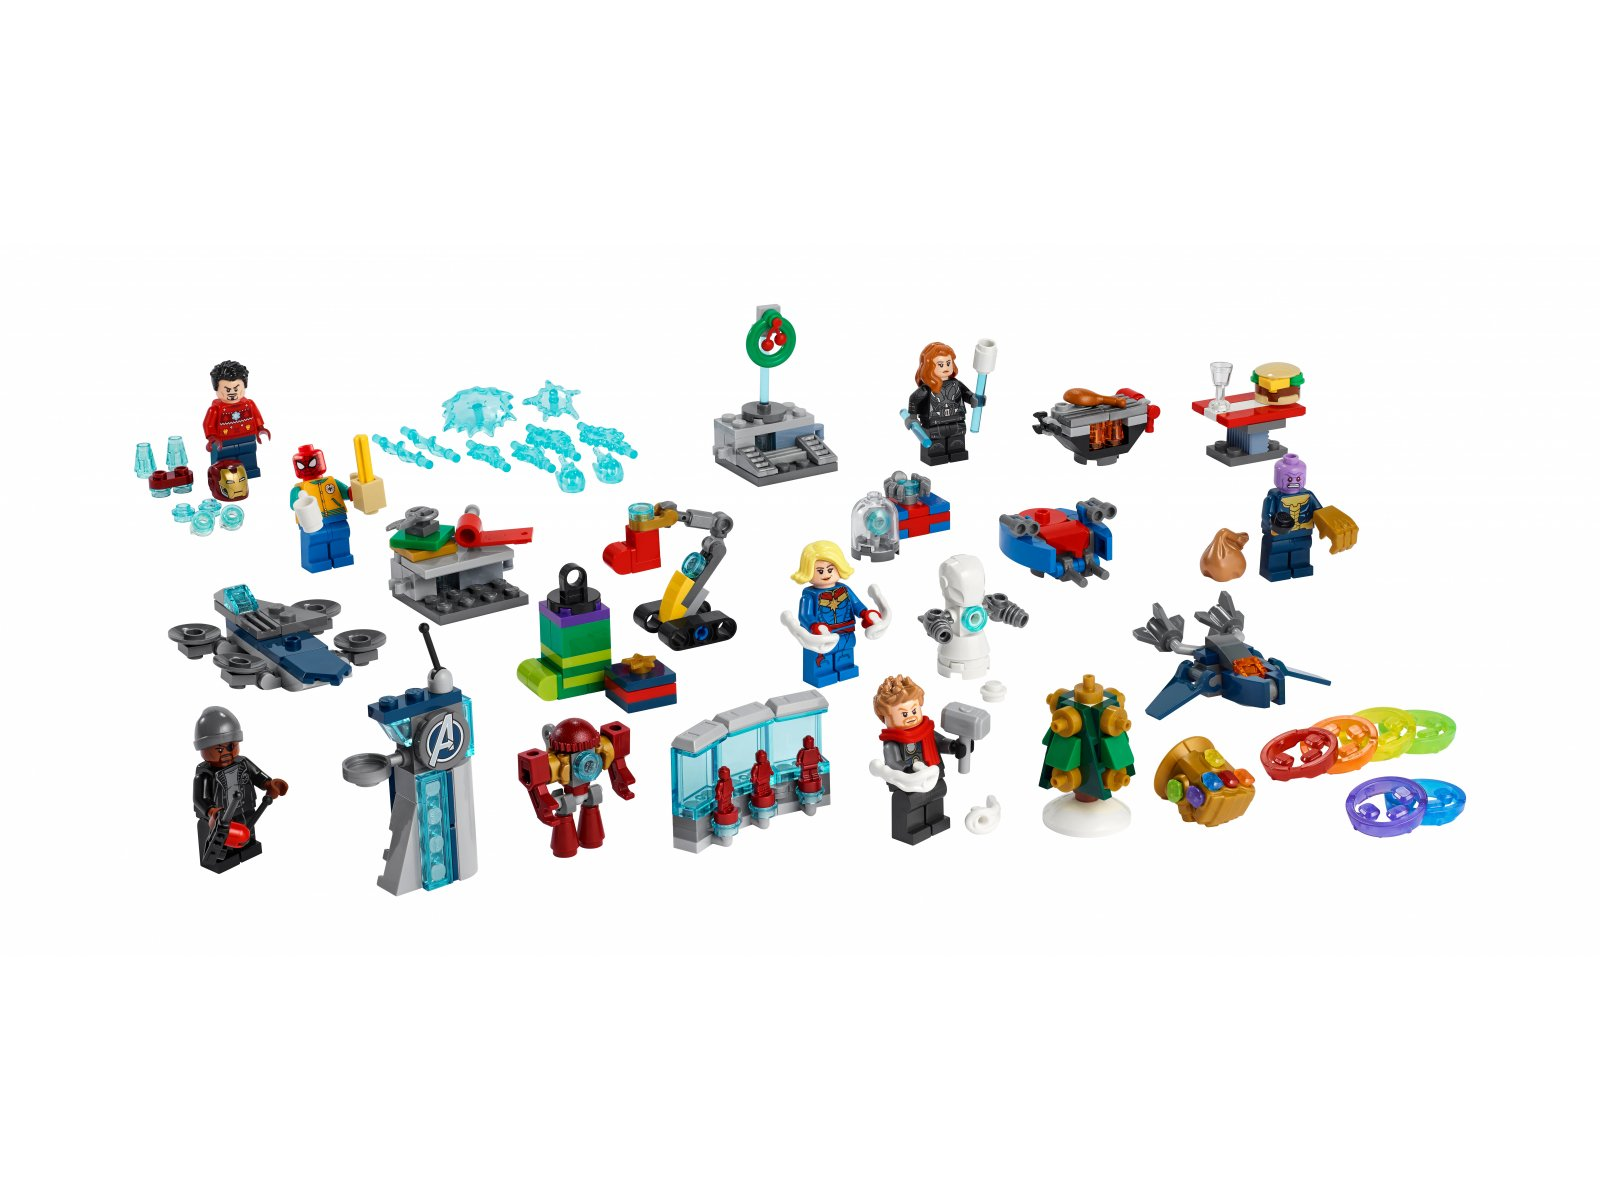 LEGO 76196 Kalendarz adwentowy Avengers